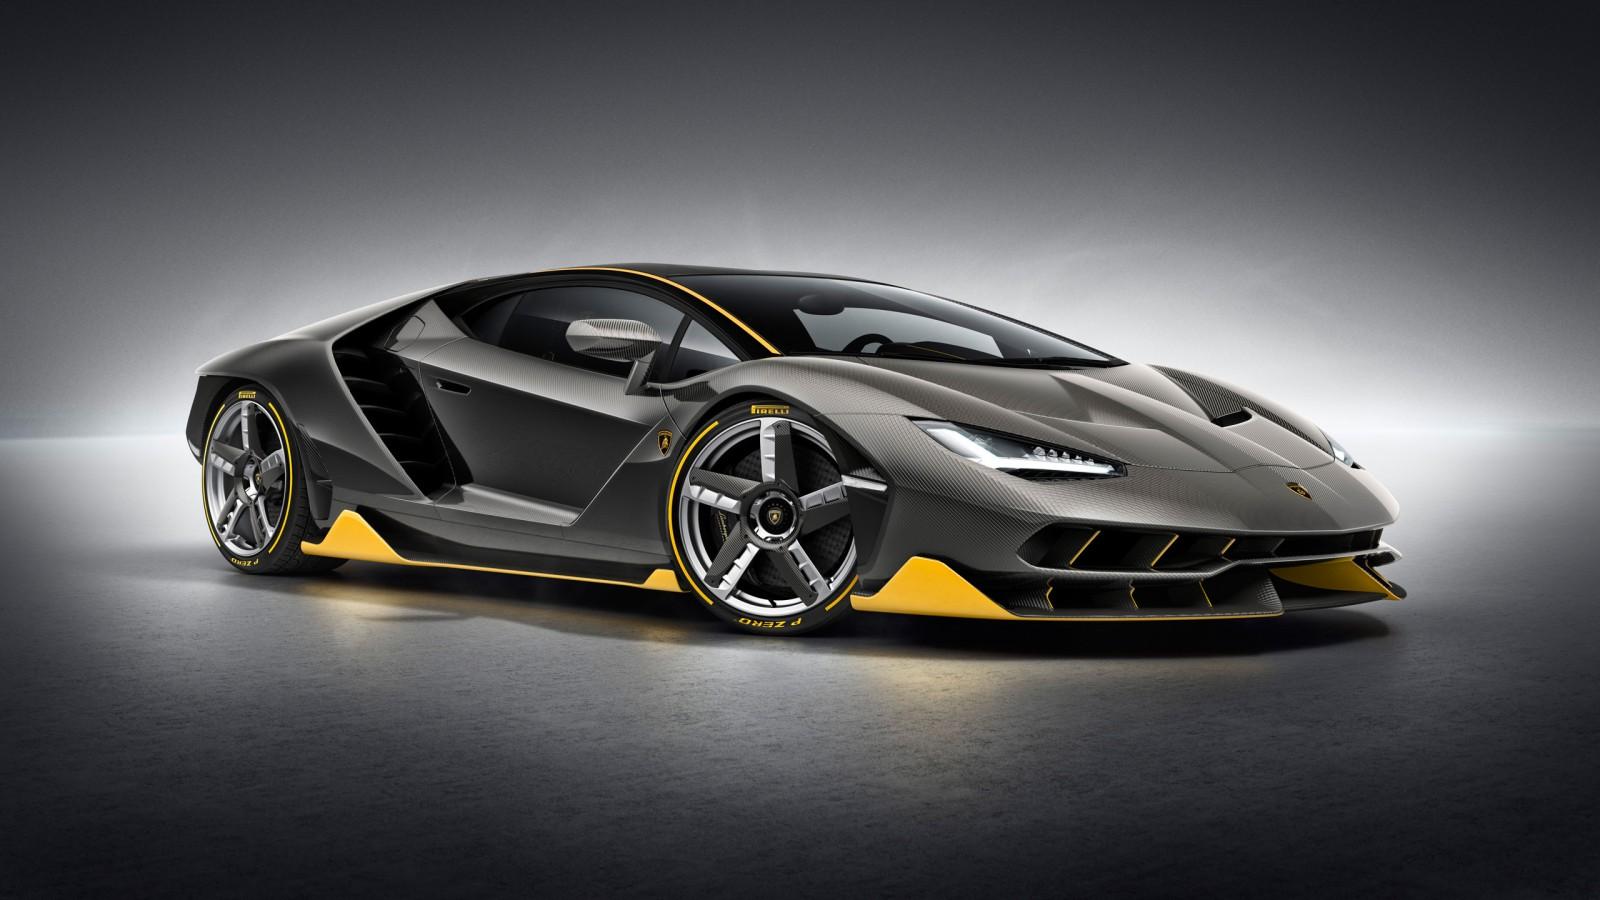 Lincoln Wallpaper Car 2016 Lamborghini Centenario Wallpaper Hd Car Wallpapers